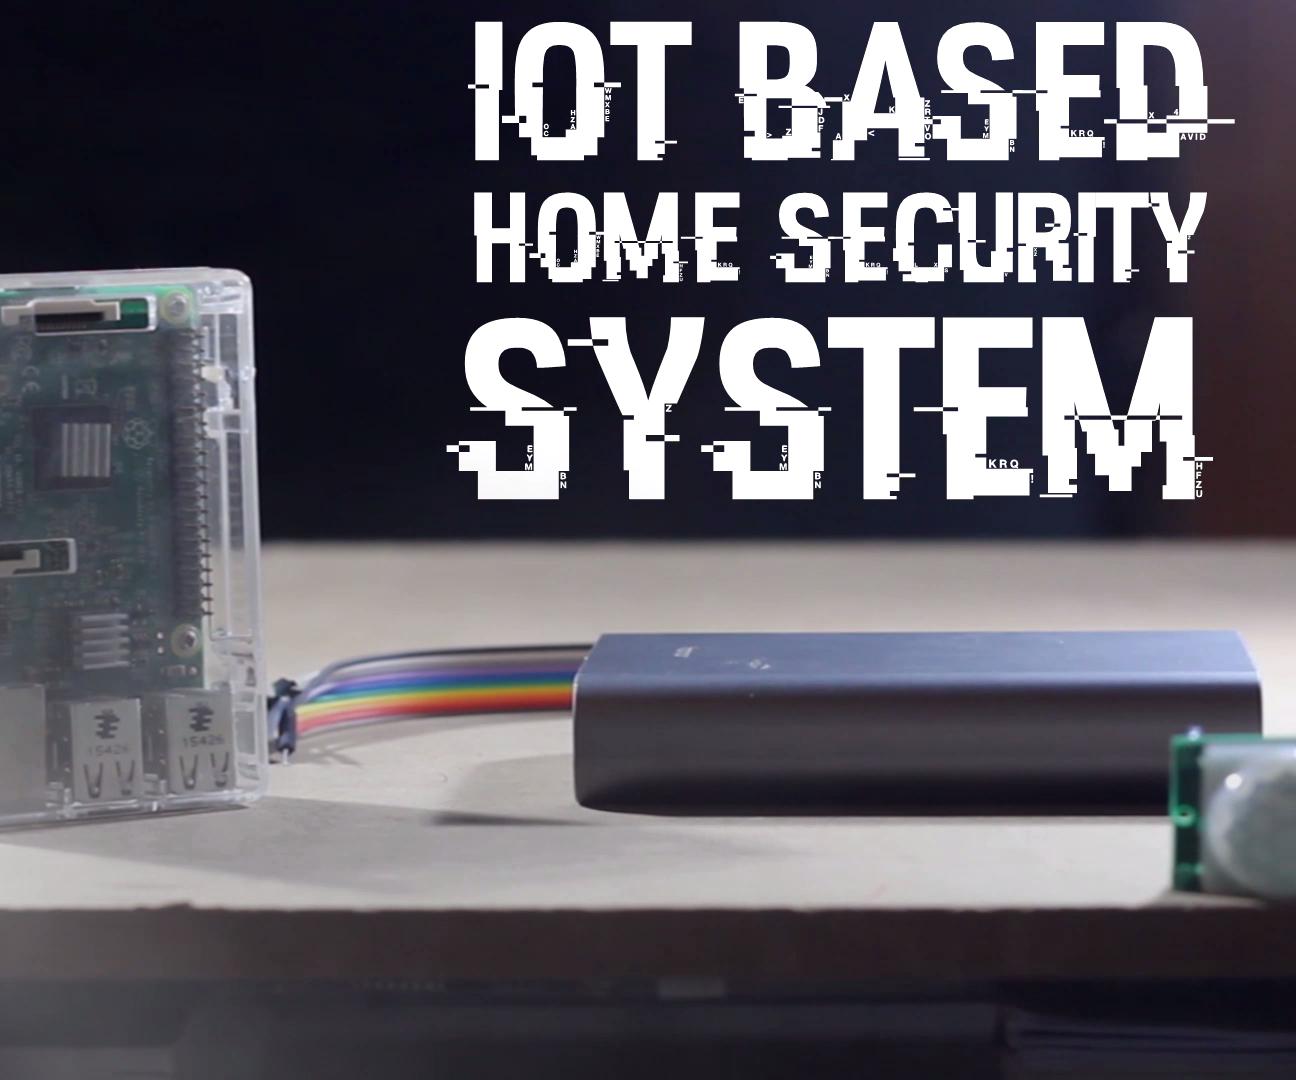 IoT Based Home Security system ( Raspberry + Cayenne + PIR Sensor )